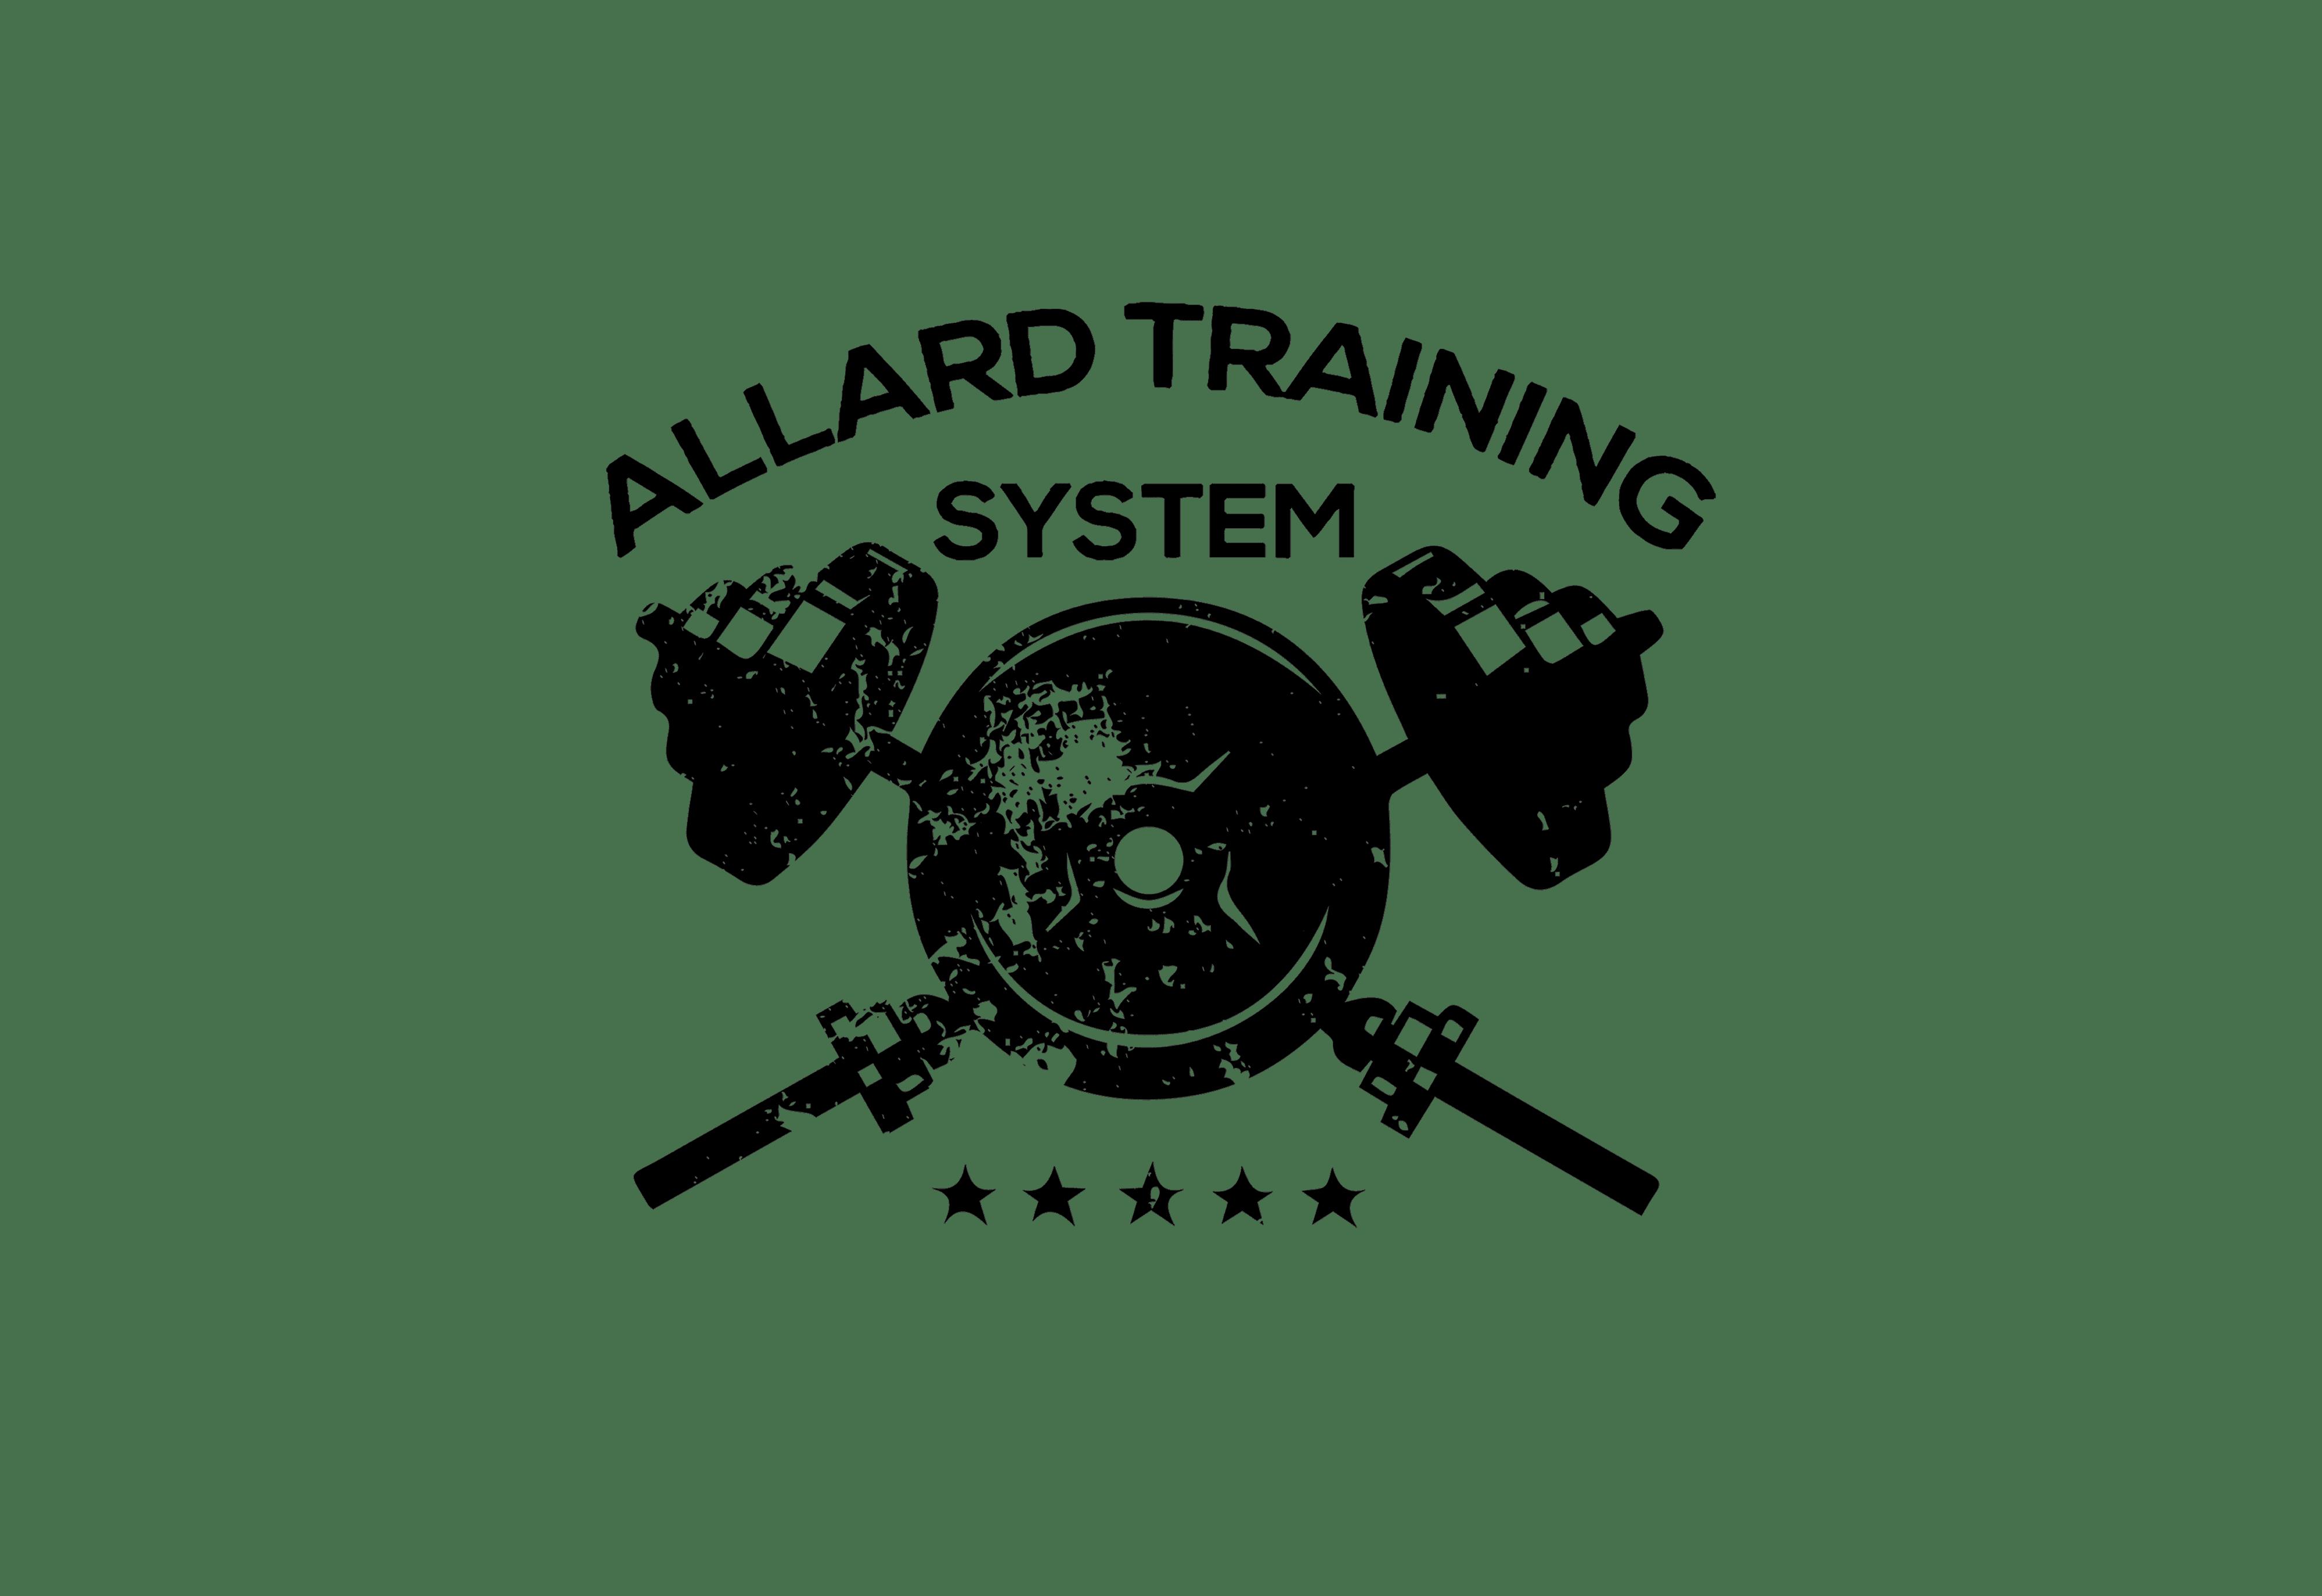 Allard training system